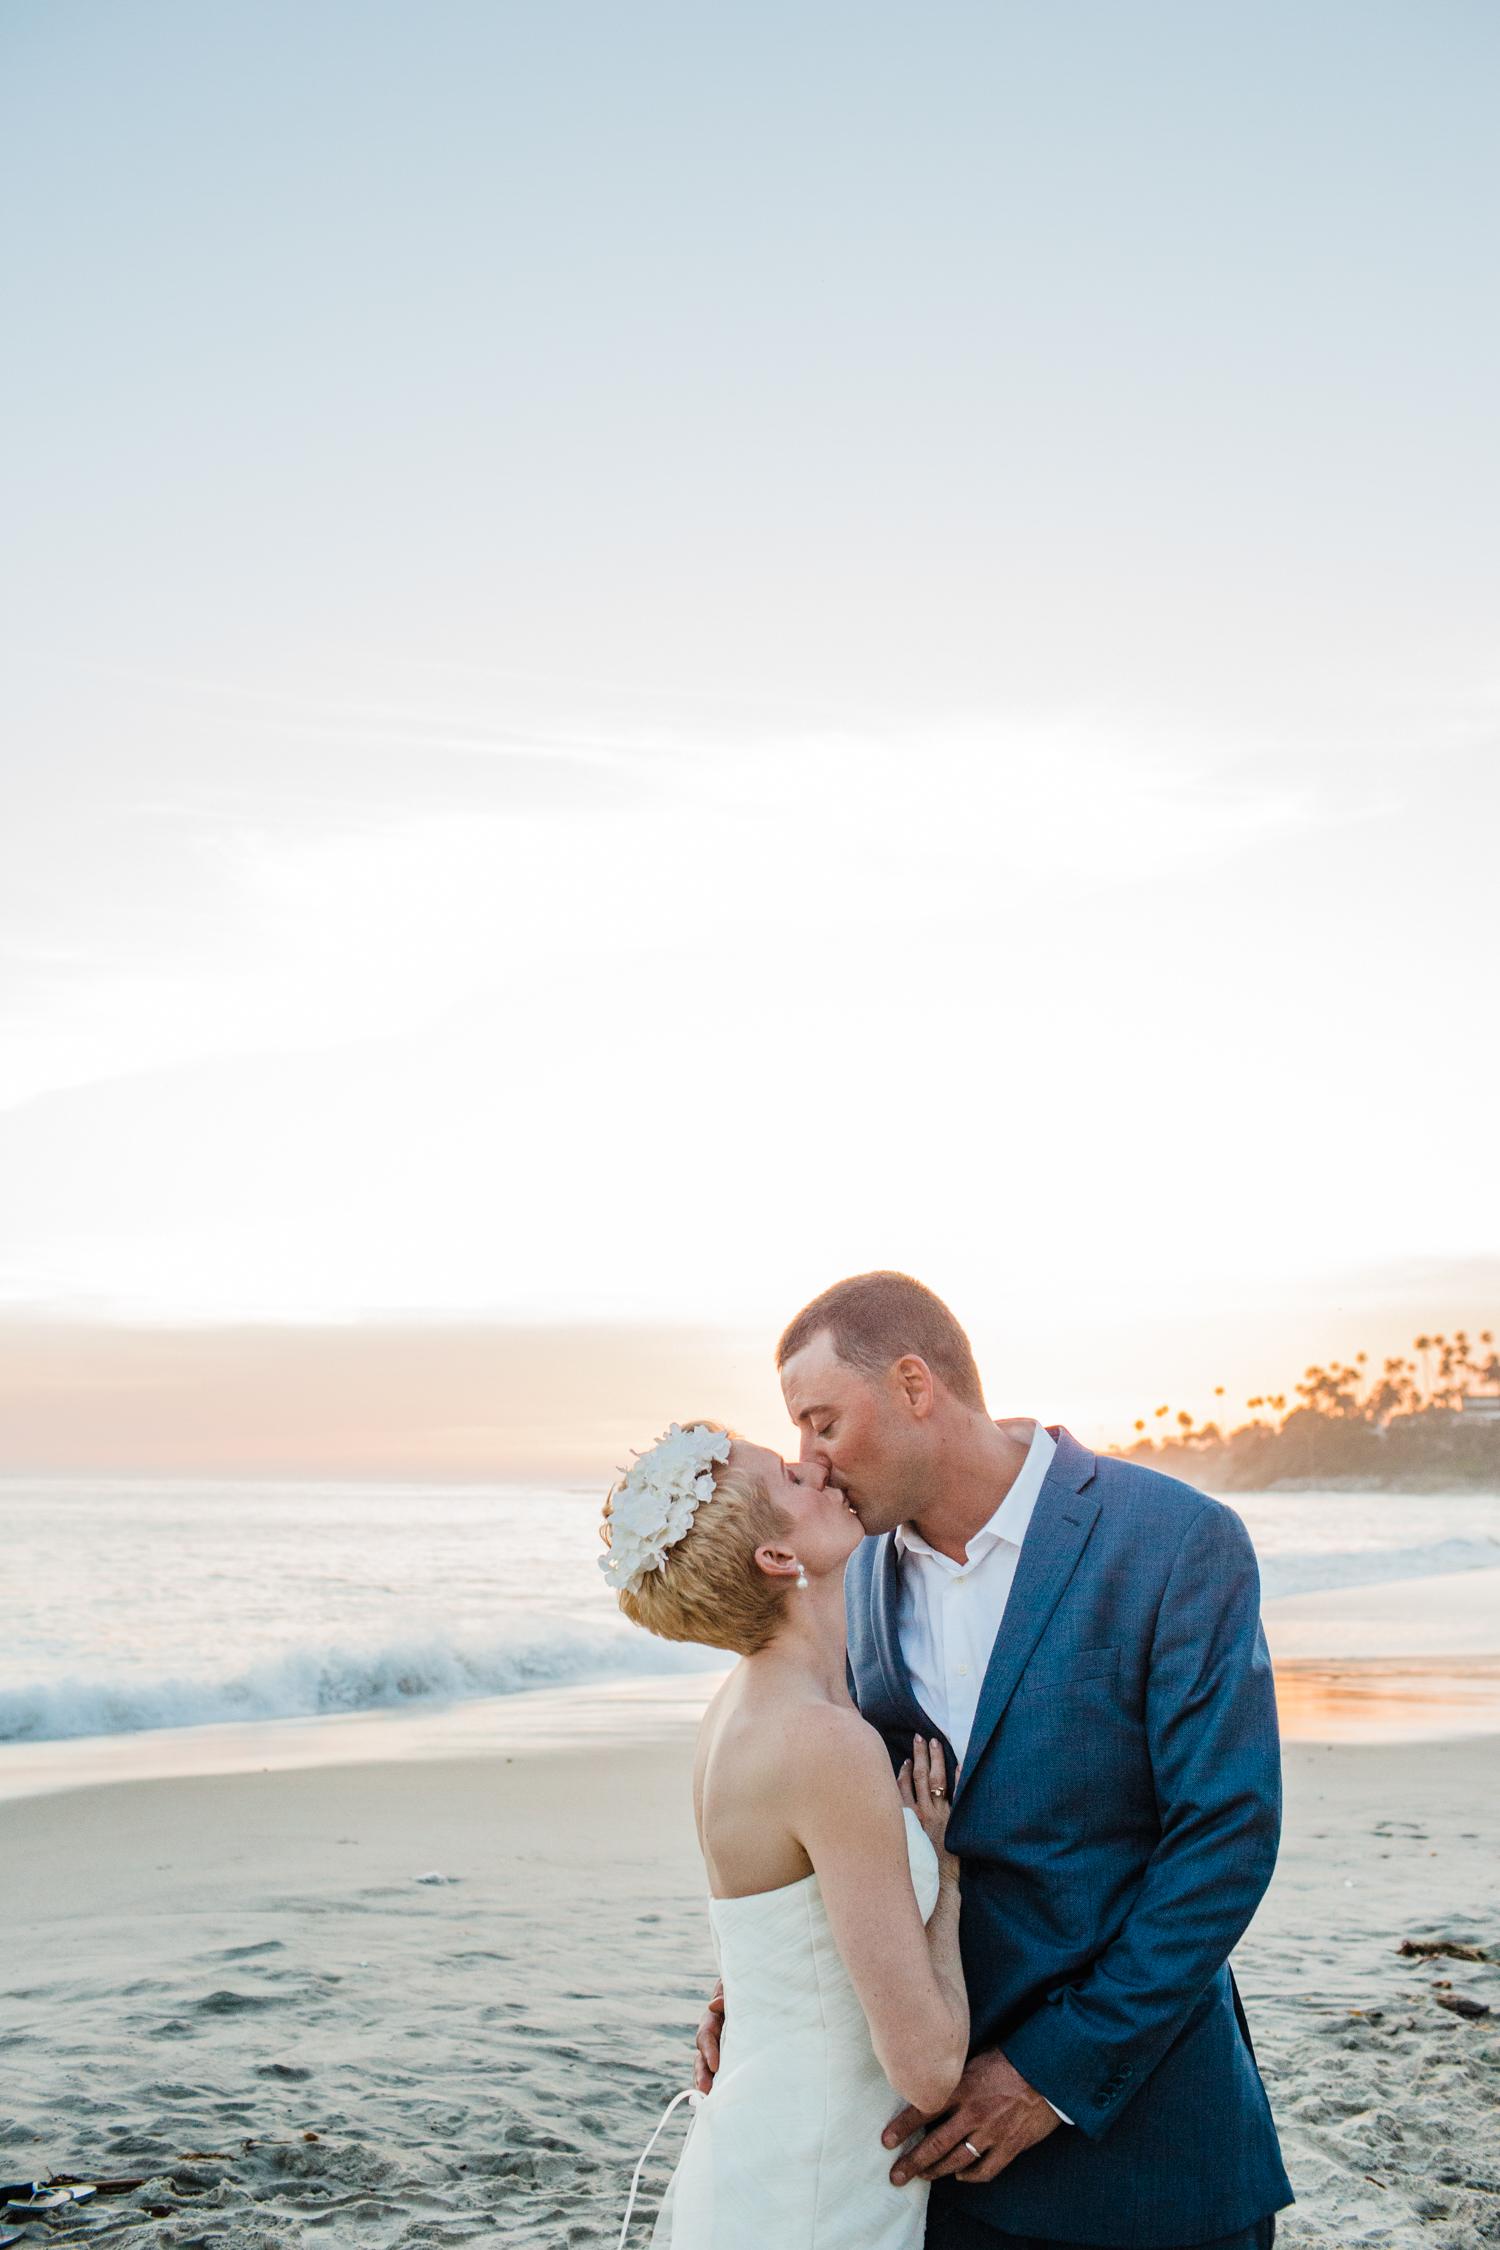 casey-brodley-lake-michigan-wedding-photographers.jpg